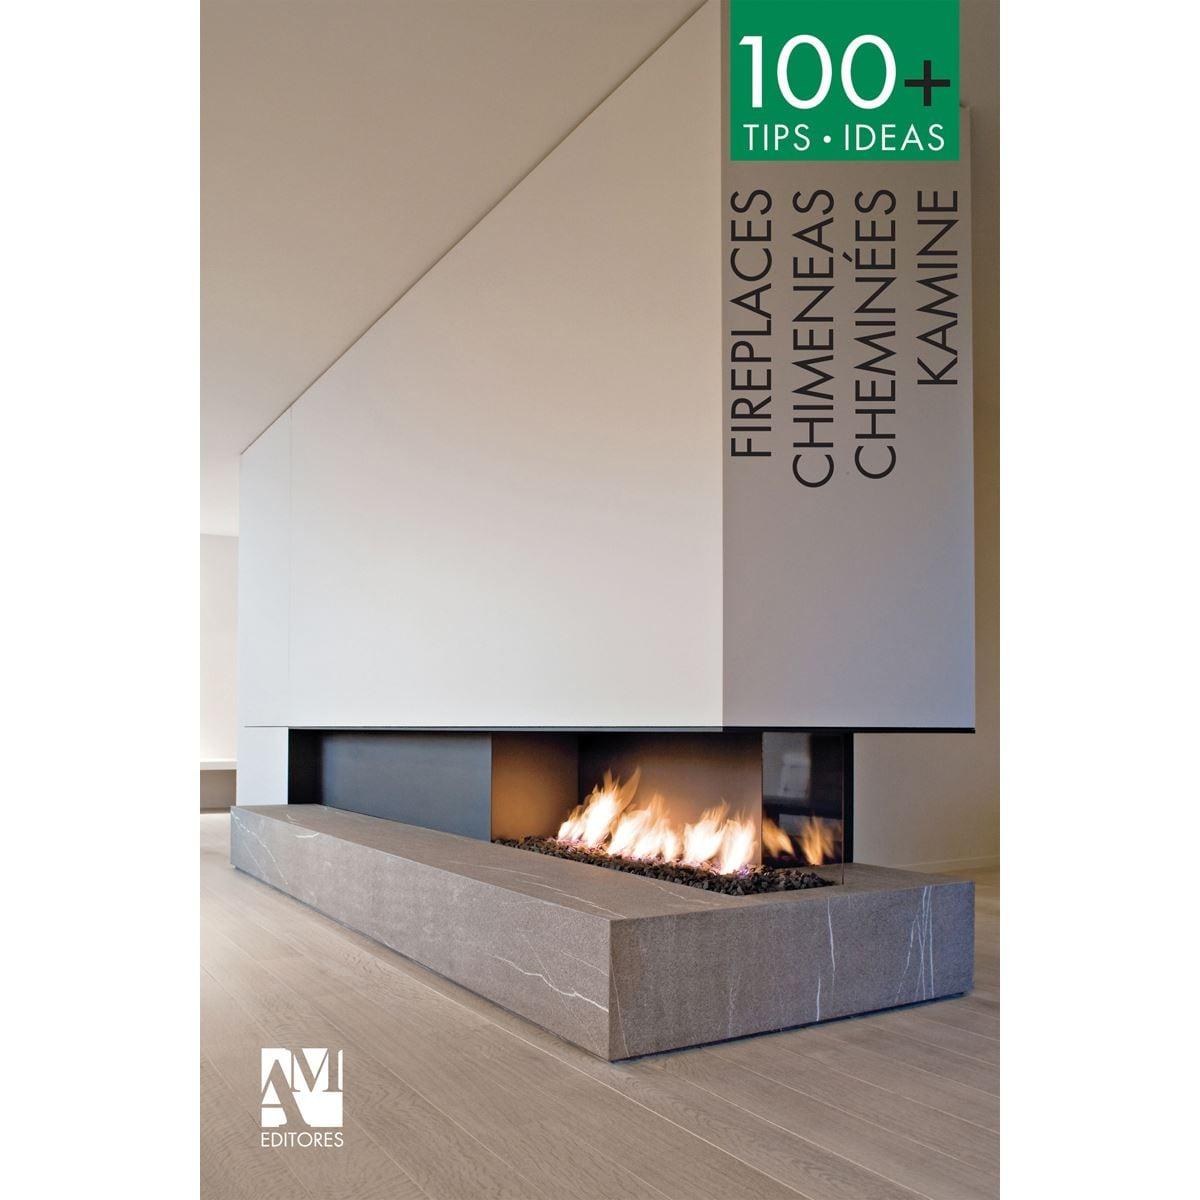 100+Tips ideas, Chimeneas